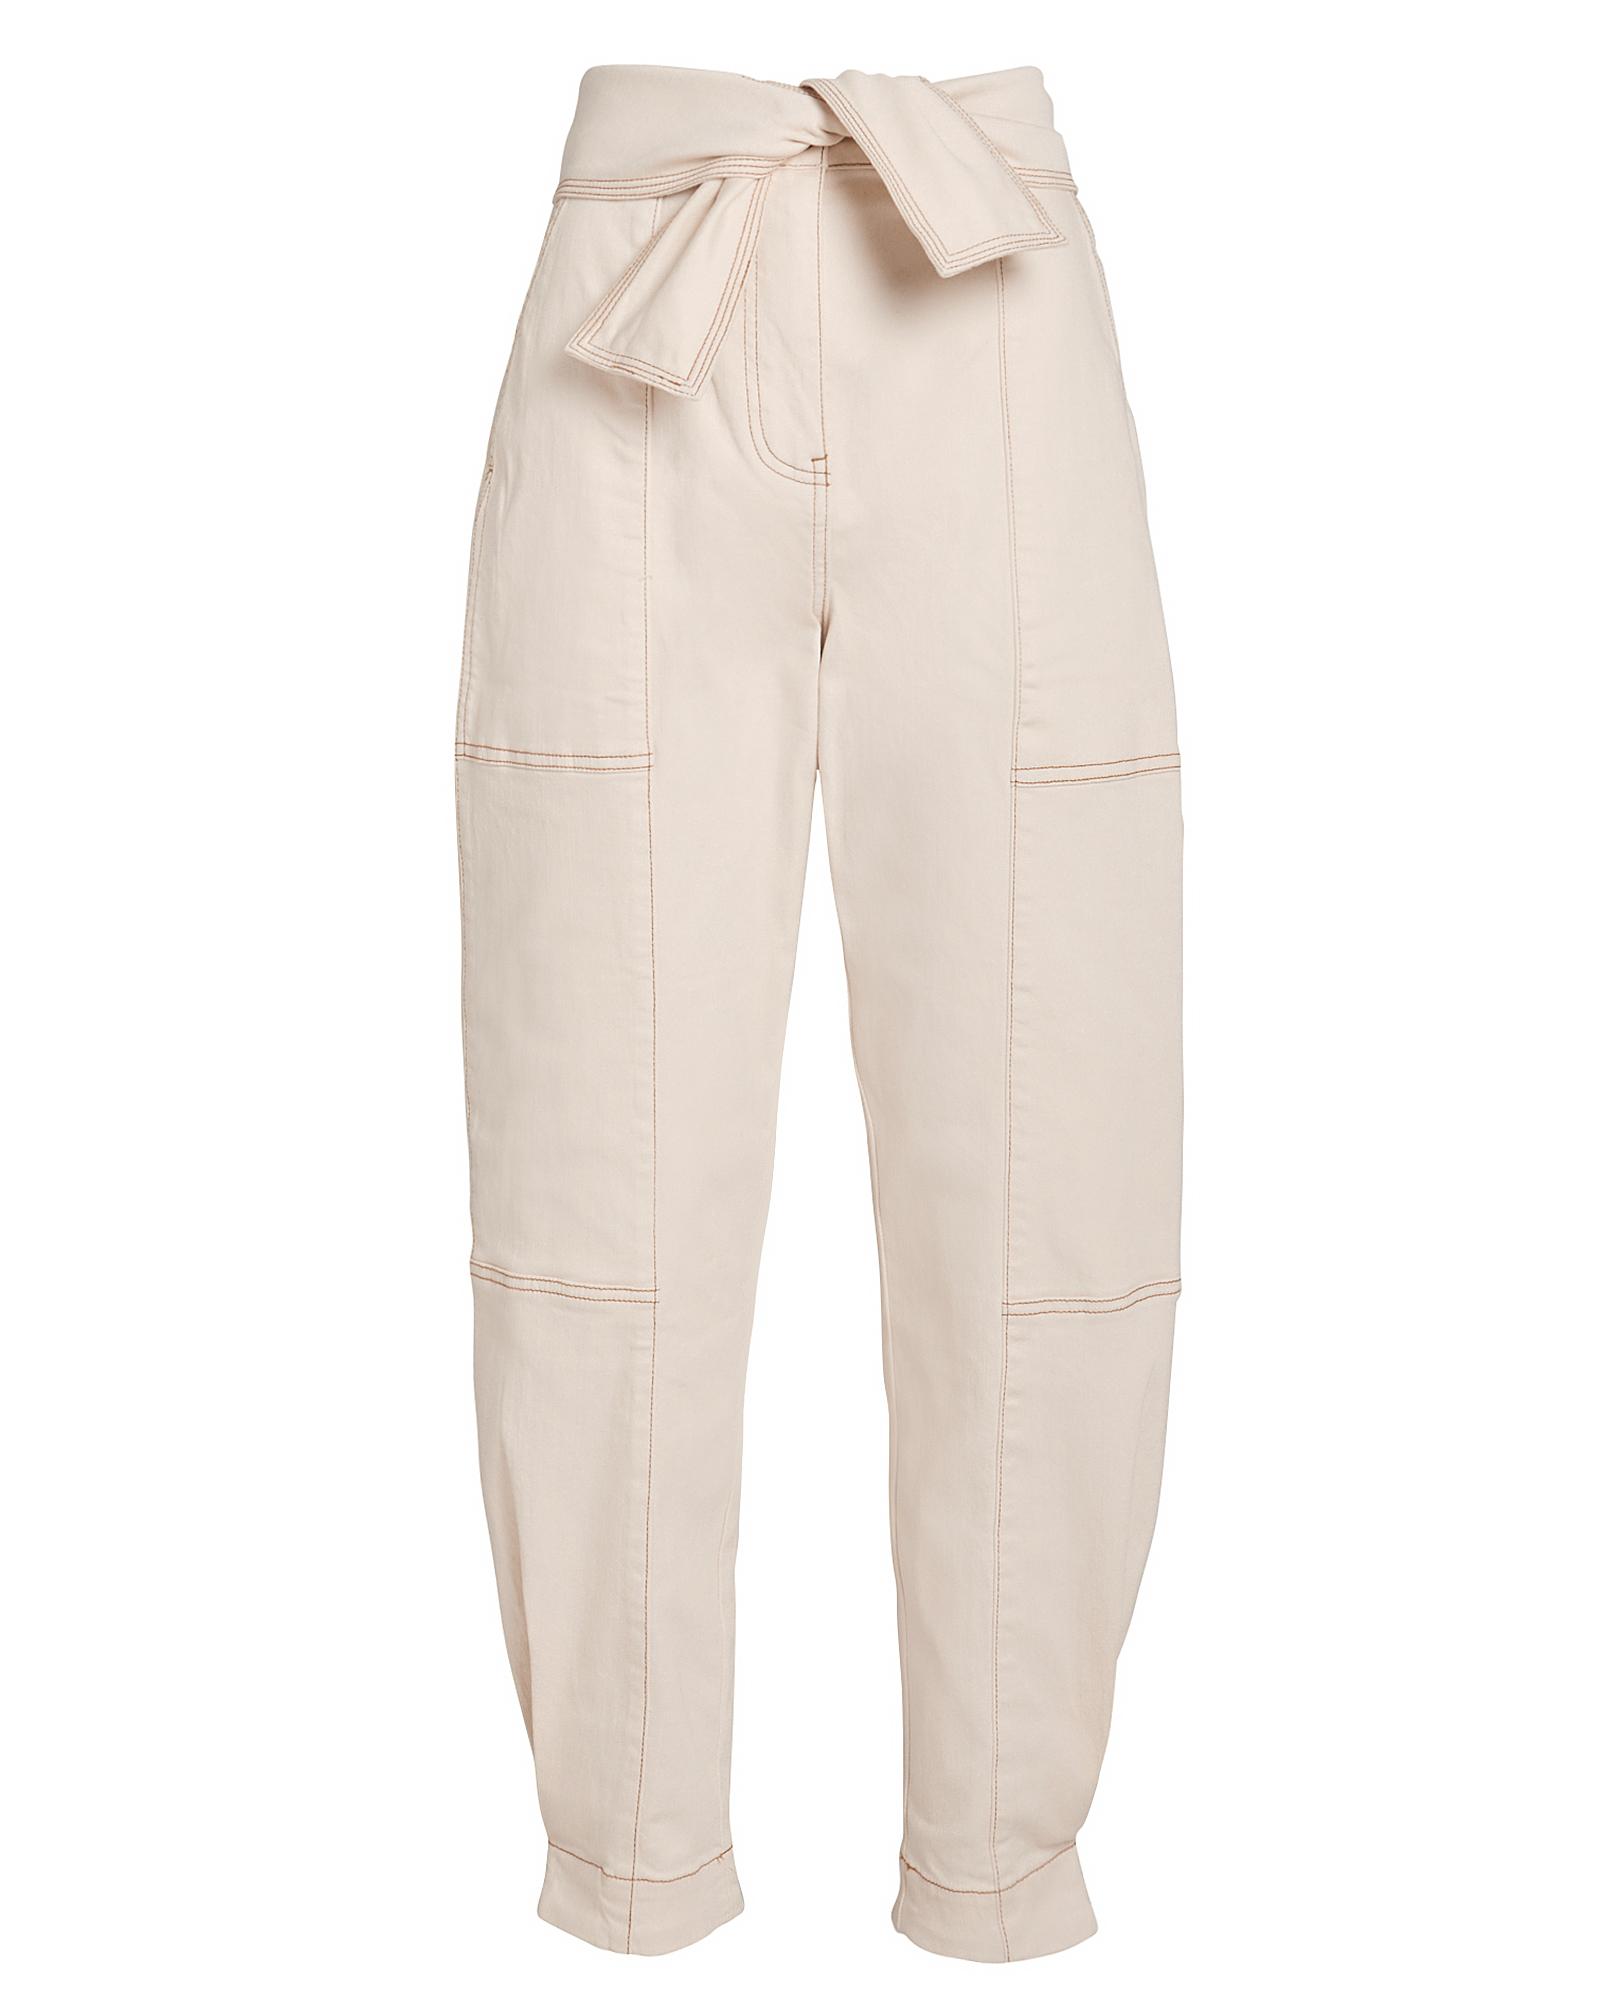 Storm Cargo Tie Waist Jeans by Ulla Johnson